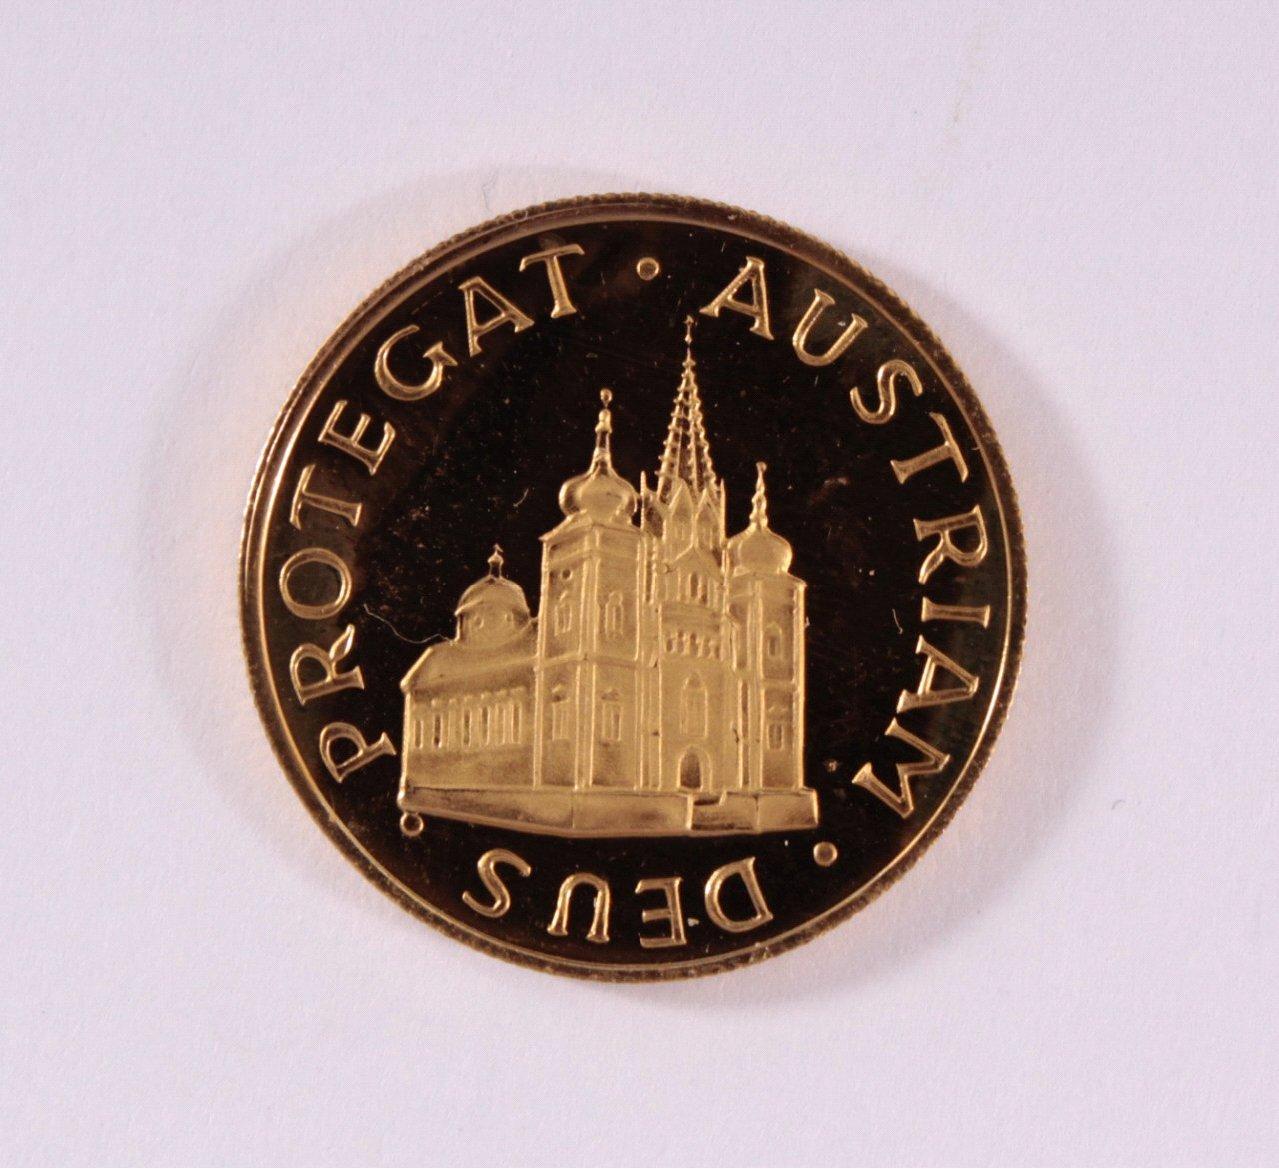 Goldmedaille 900/000 GG. Magna Mater Austriae 1963-1